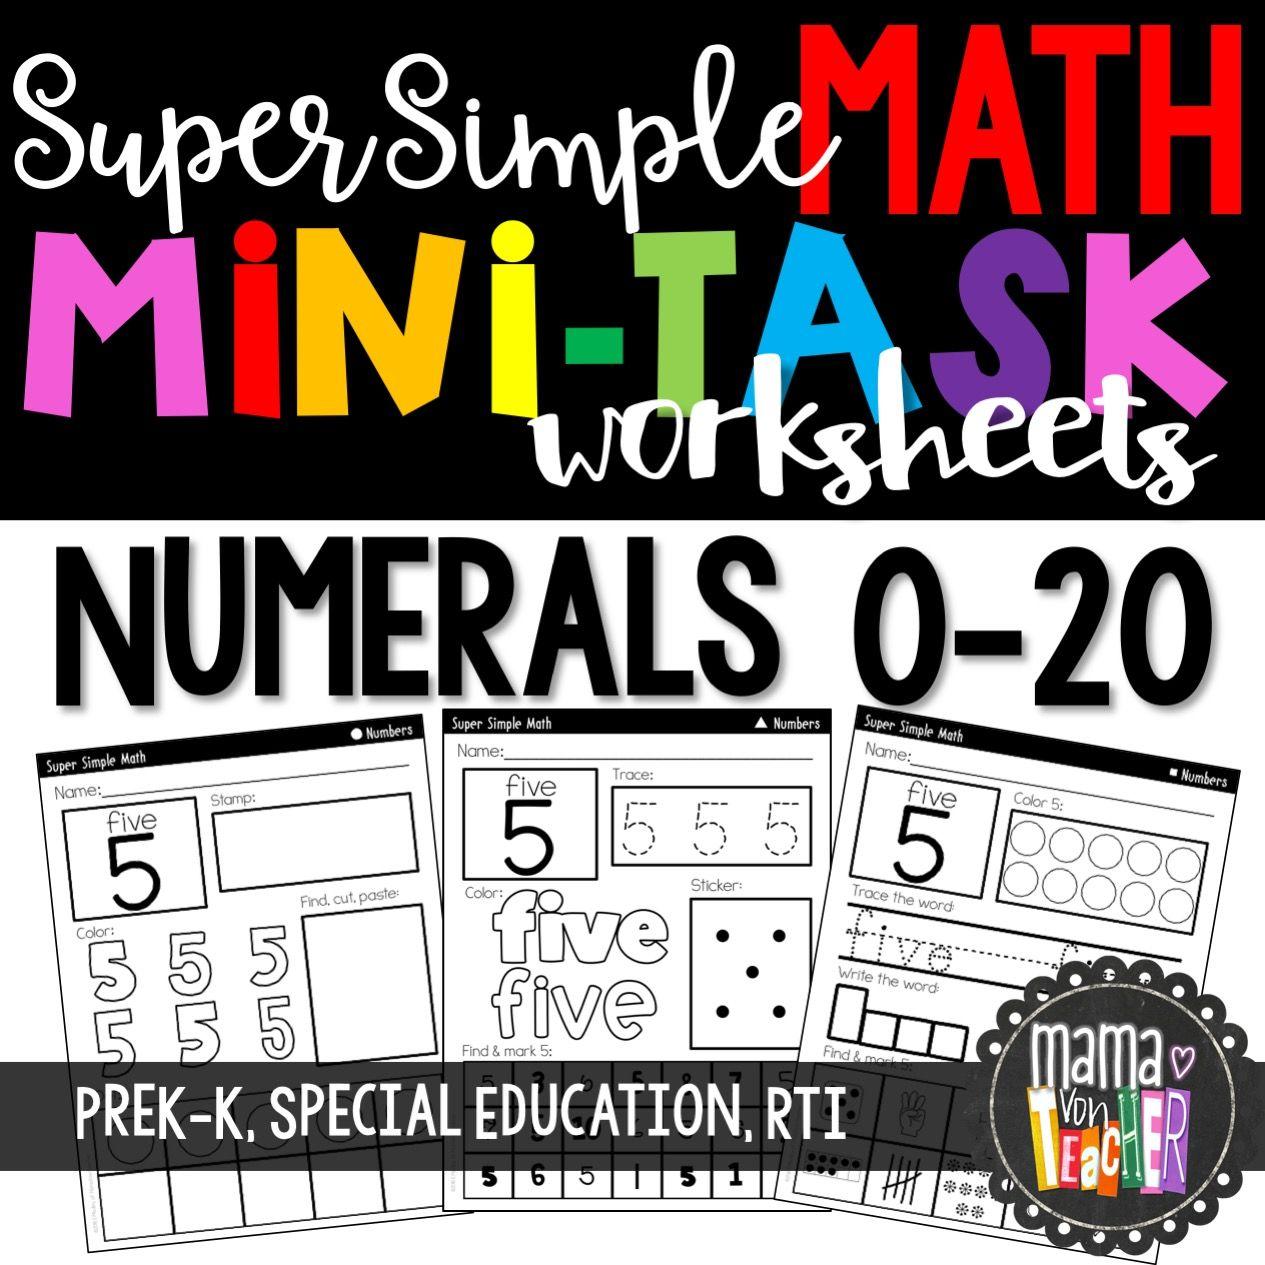 Super Simple Math Number Worksheets Numerals 0 20 No